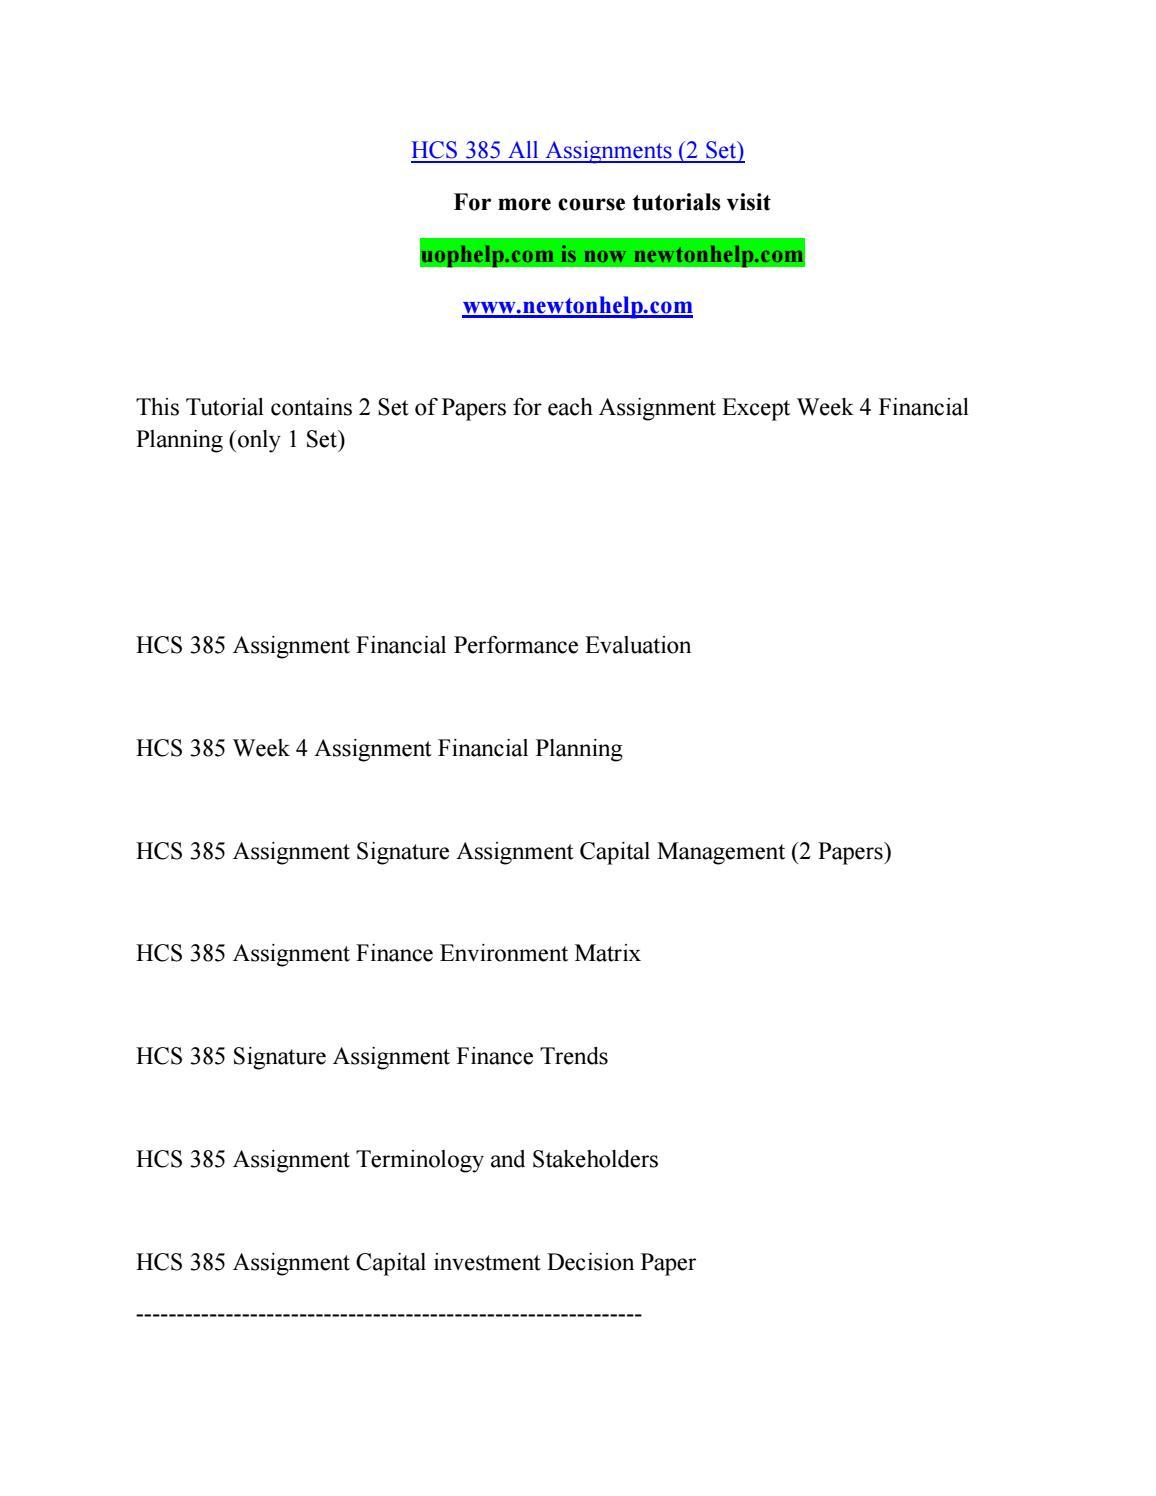 Ratio Analysis Spreadsheet Hcs 385 intended for Hcs 385Chrysantemumdelph.i.n.ium  Issuu